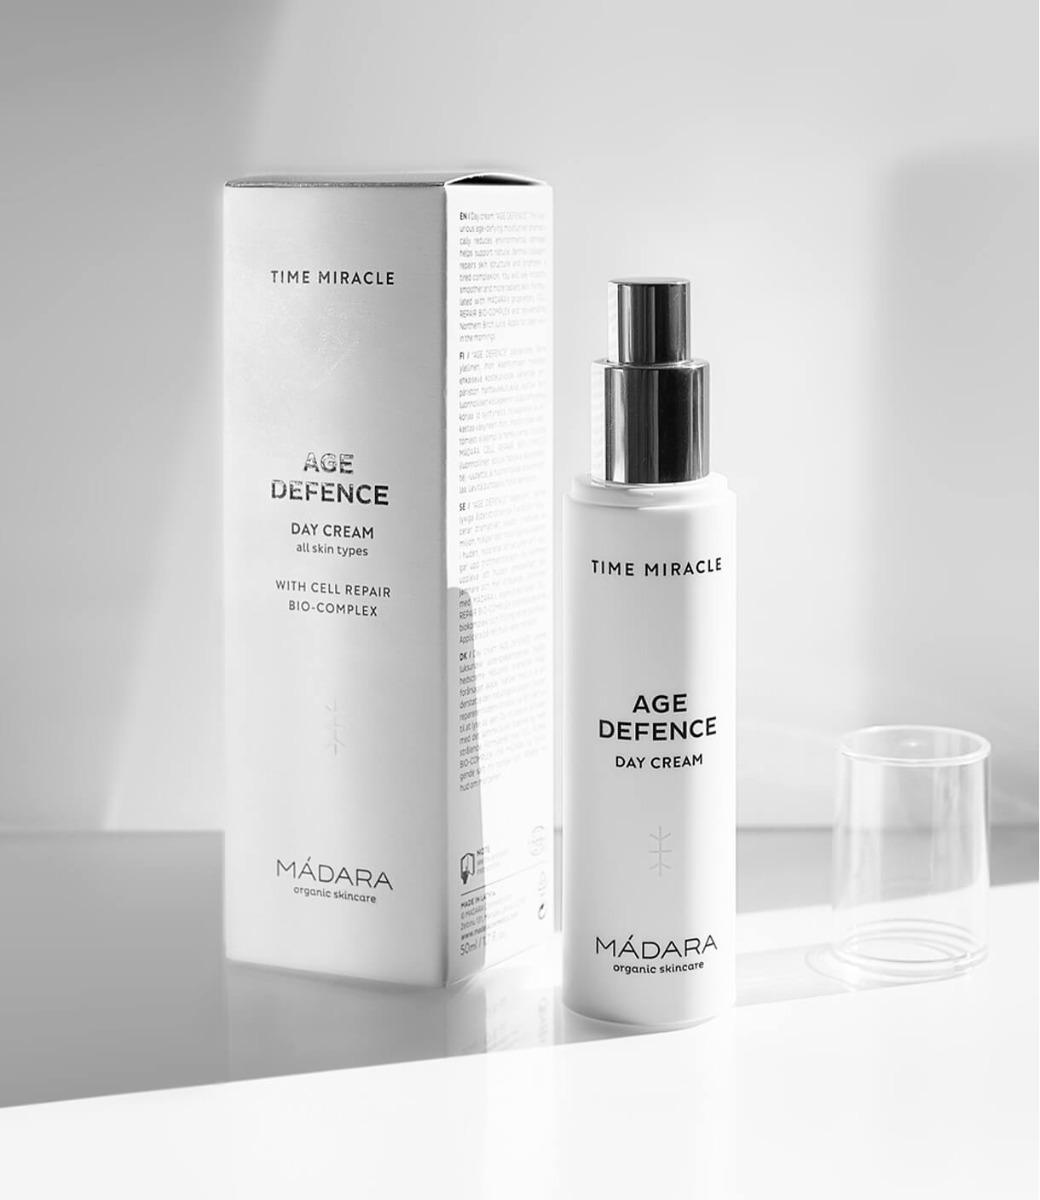 MADARA Cosmetics Time Miracle